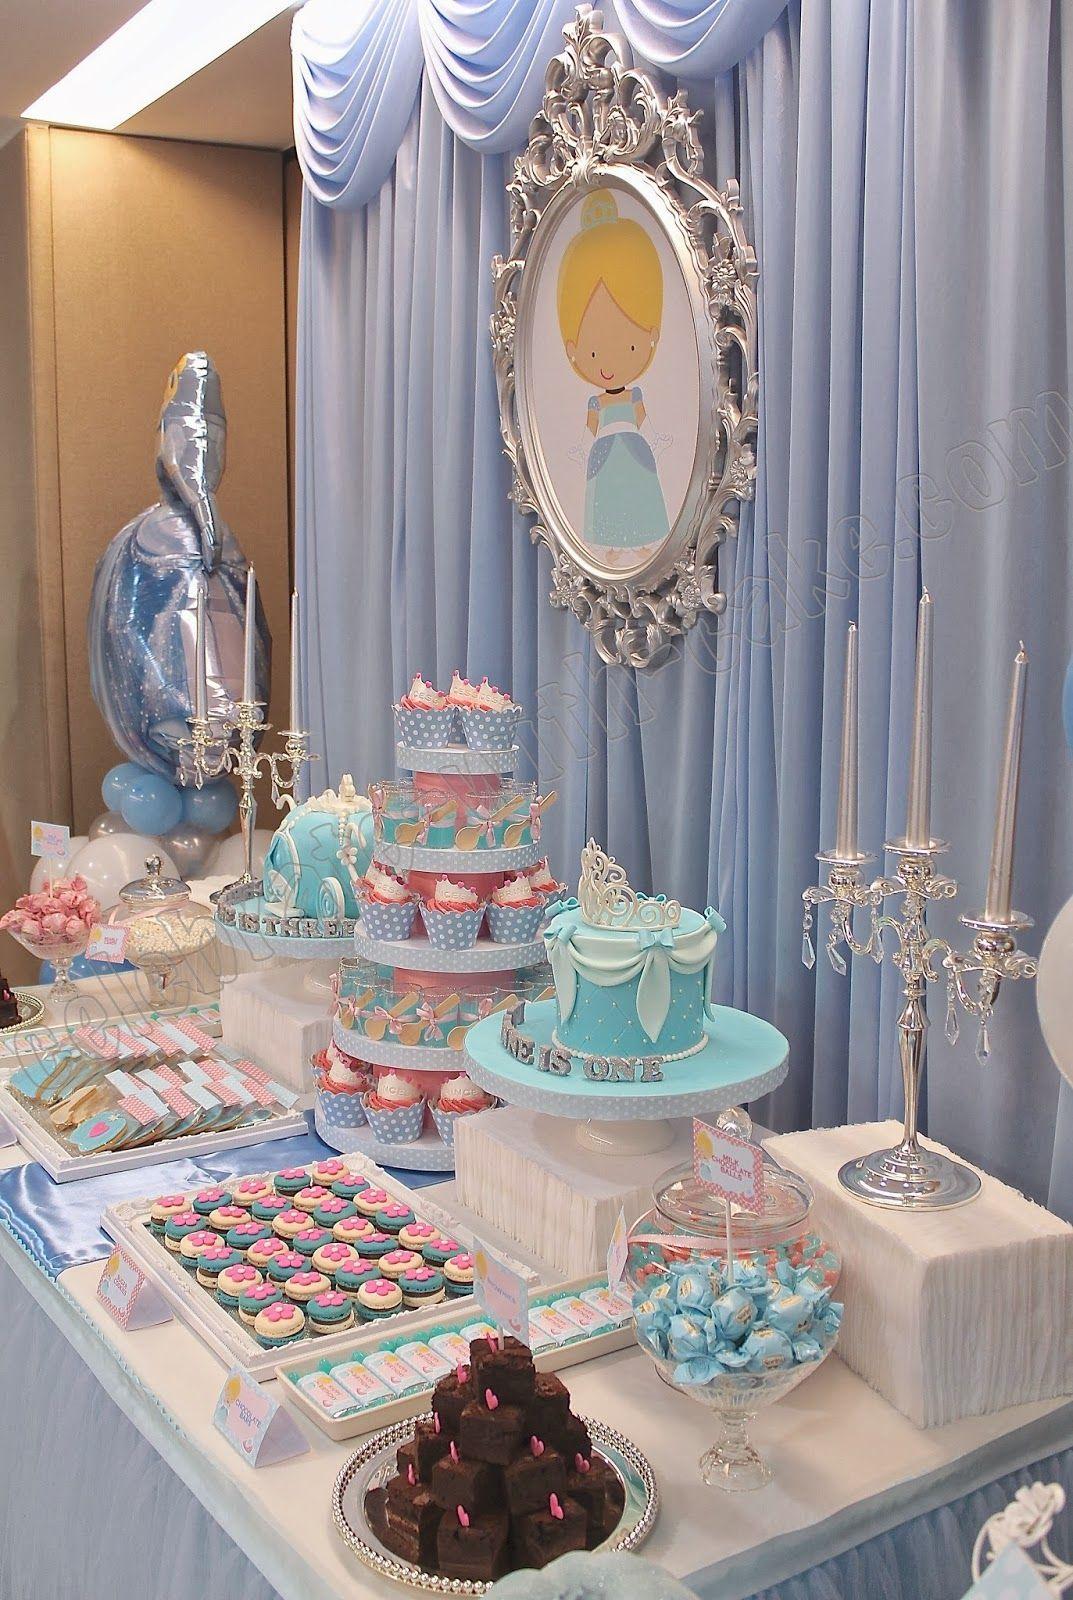 Celebrate with Cake!: Cinderella Dessert Table | Birthday ...